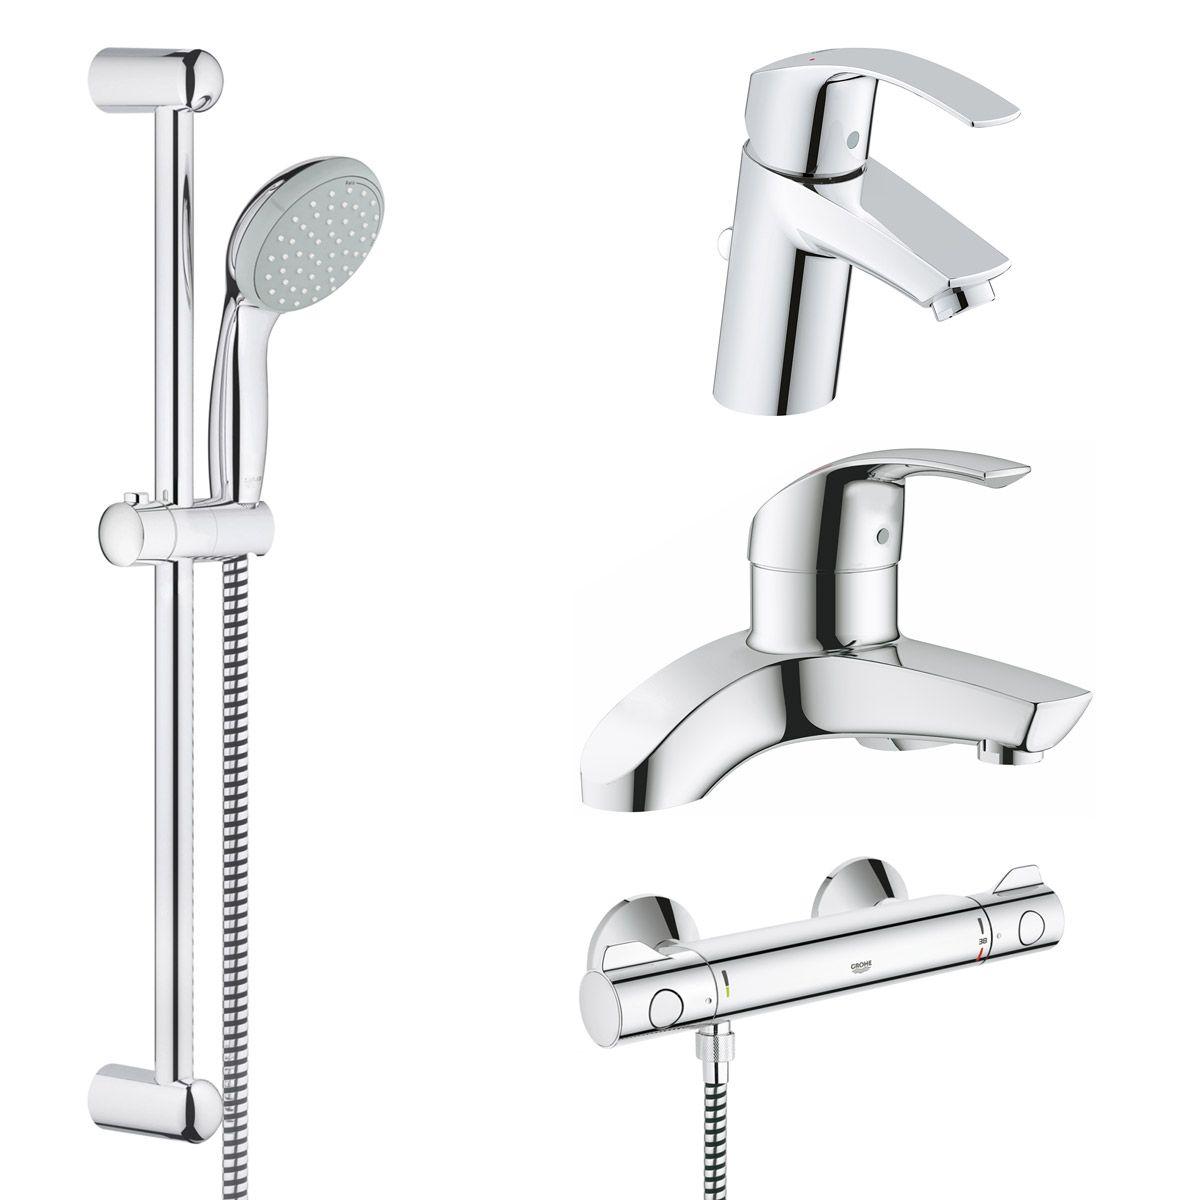 Atlin Bath Shower Mixer With Handheld Shower Head Bath Tap